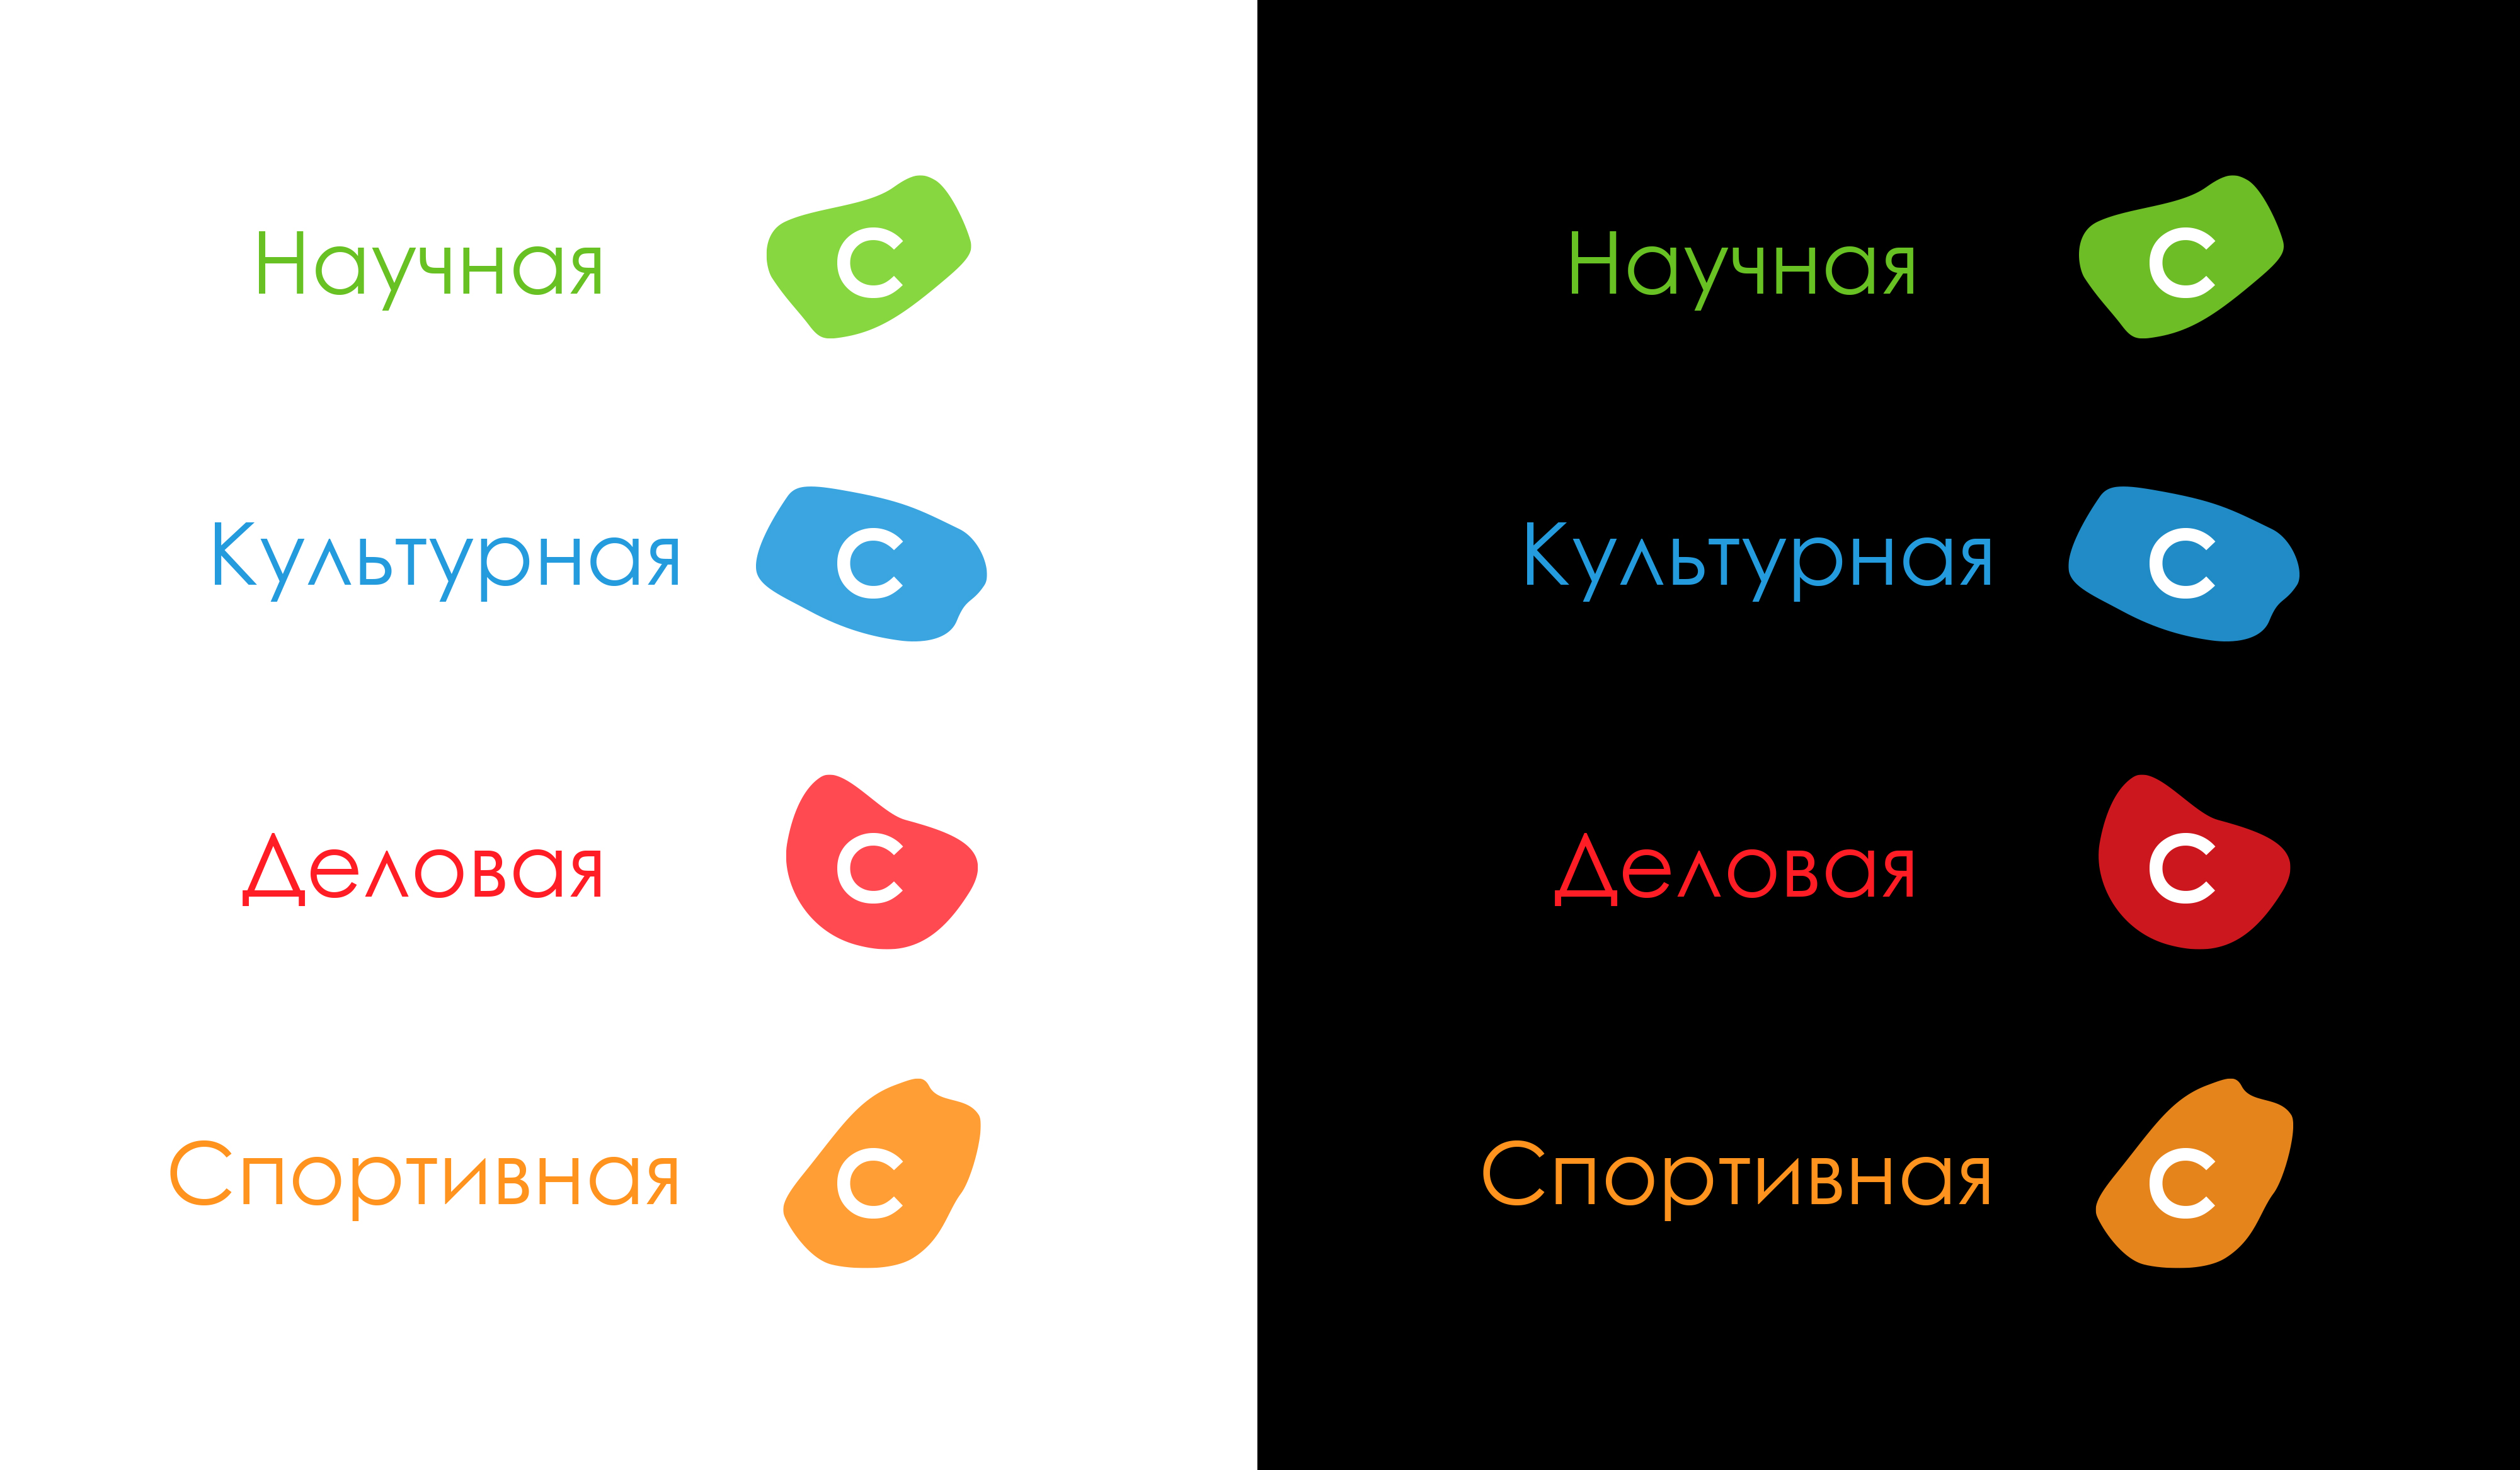 Разработка логотипа для творческого портала фото f_0735b5fd1d4a73d4.jpg